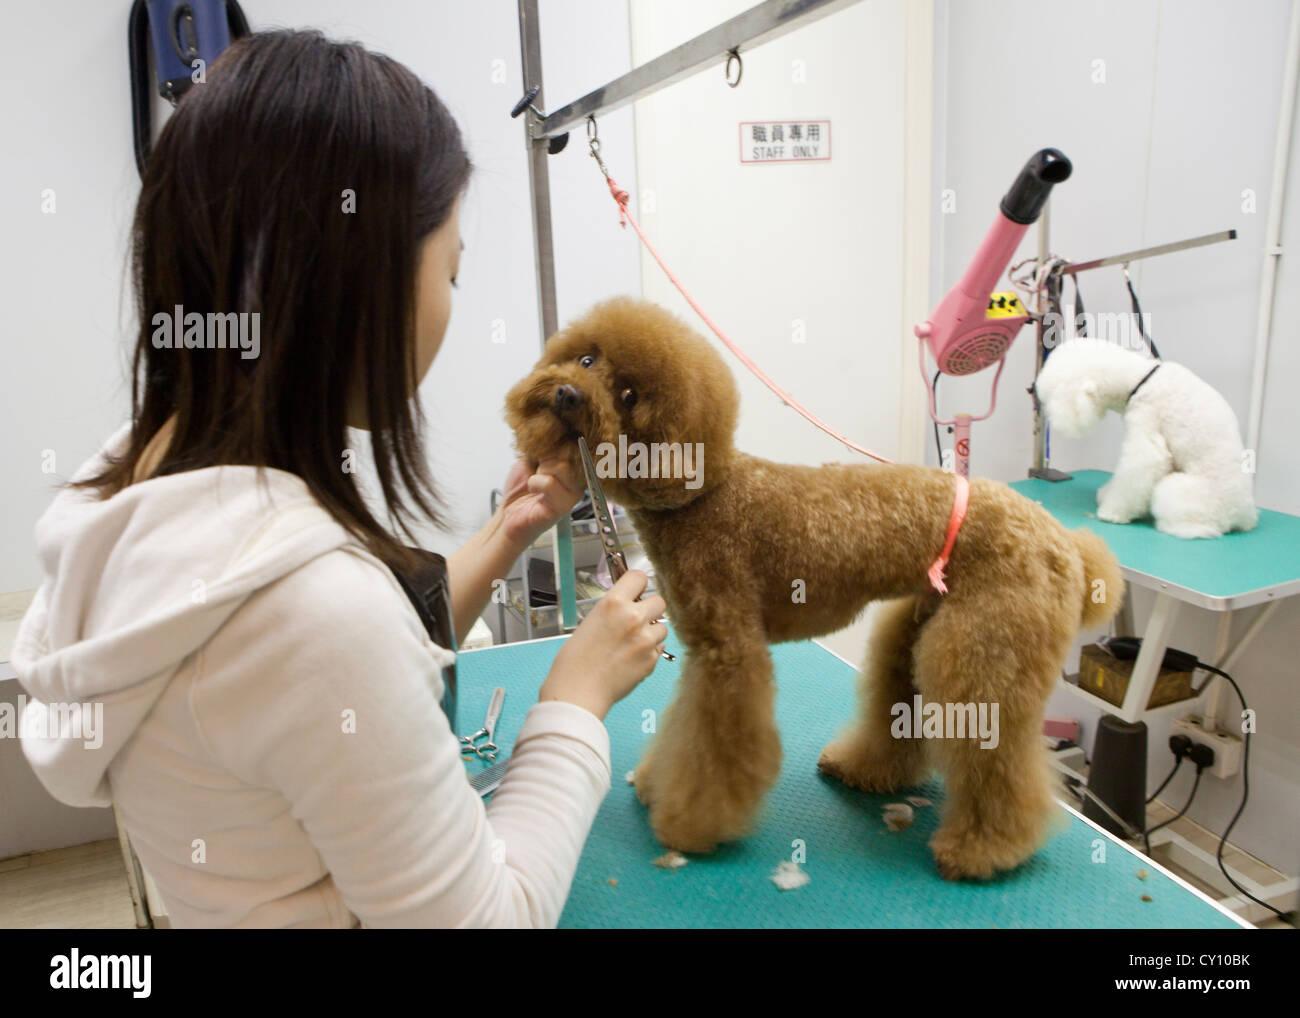 dogtrim salon in Hongkong - Stock Image